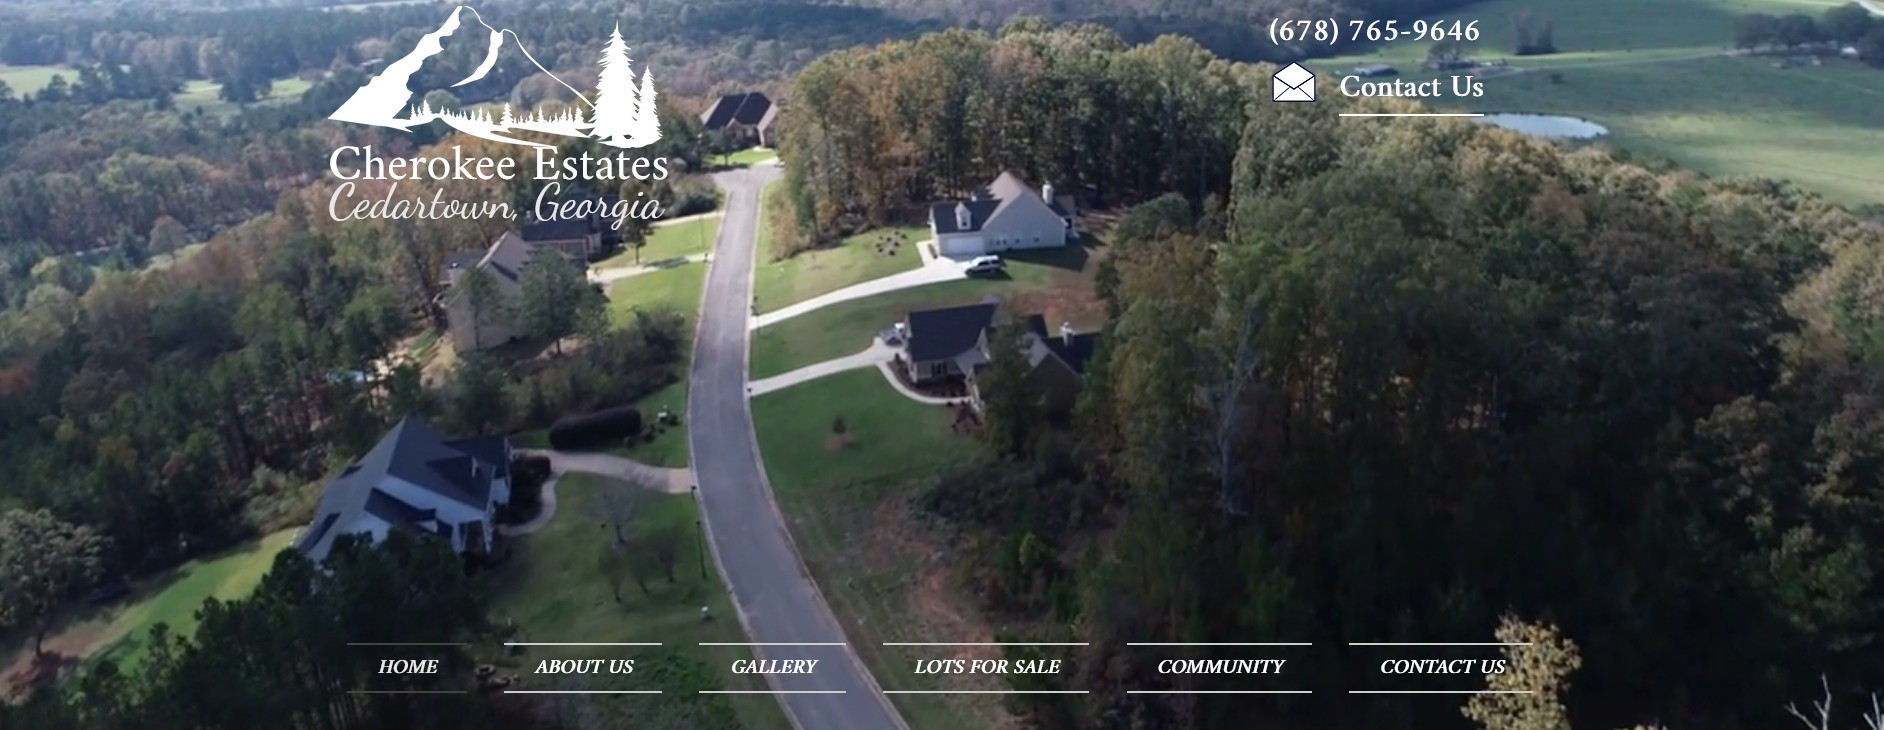 Cherokee Estates